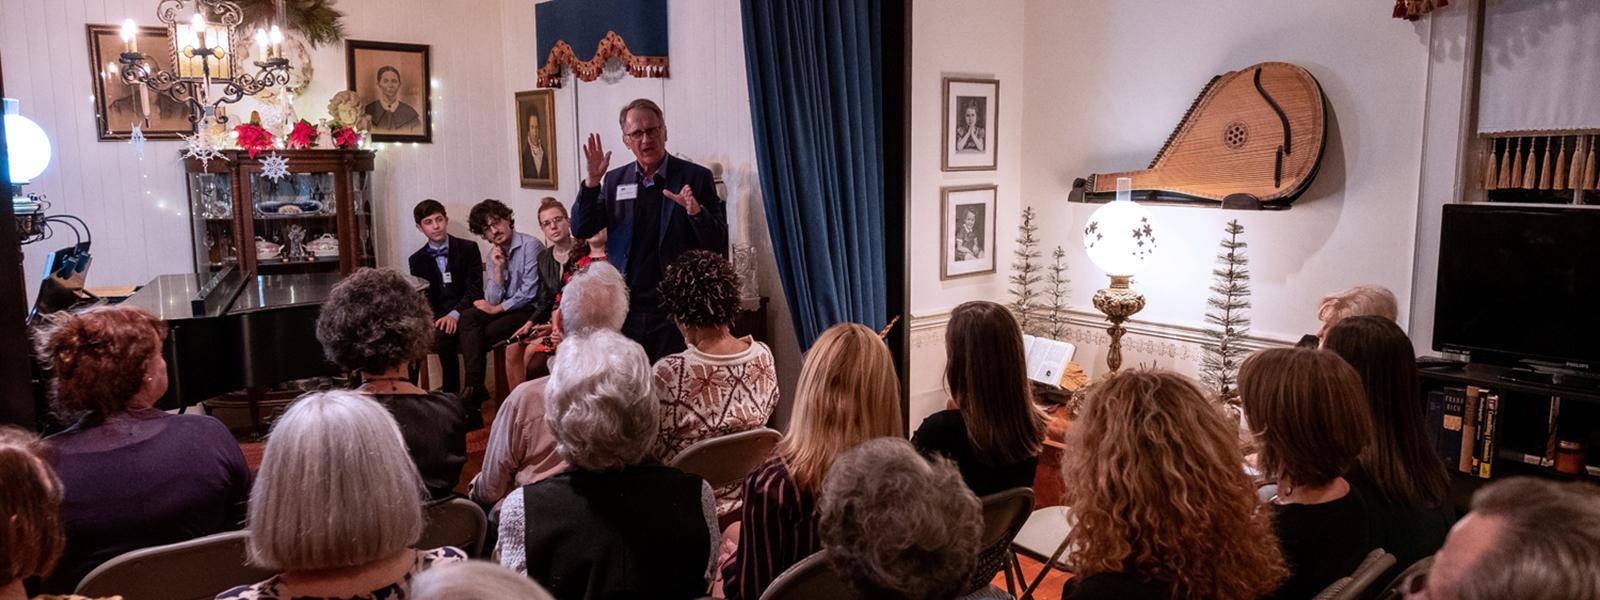 Tony Woodcock, addressed guests at Salon @ Six